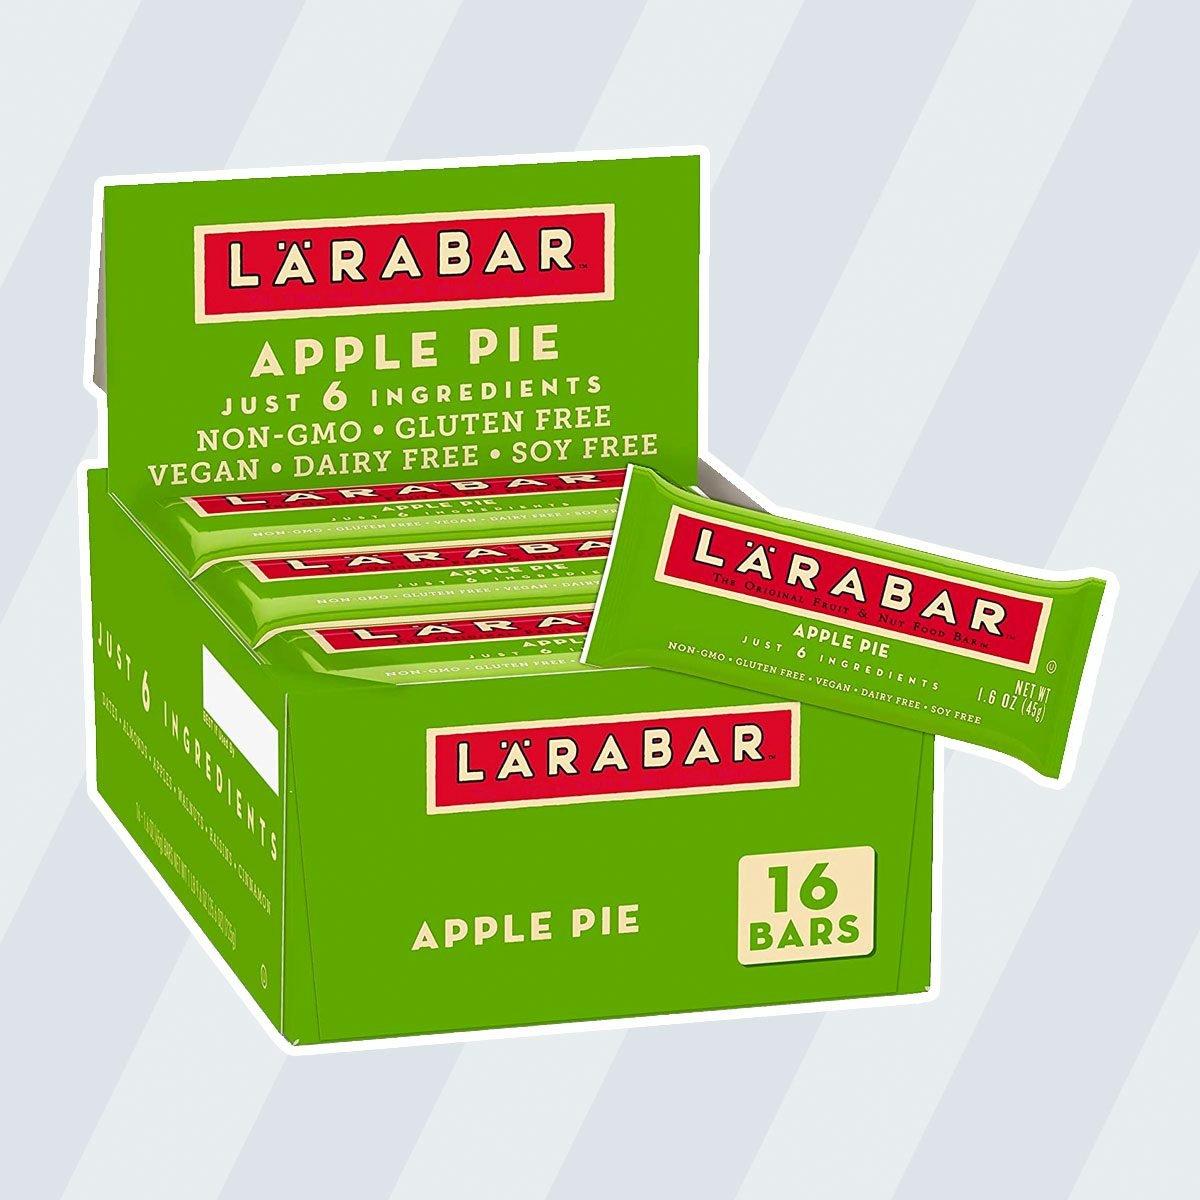 kosher snacks Larabar Gluten Free Bar, Apple Pie, 1.6 oz Bars (16 Count)